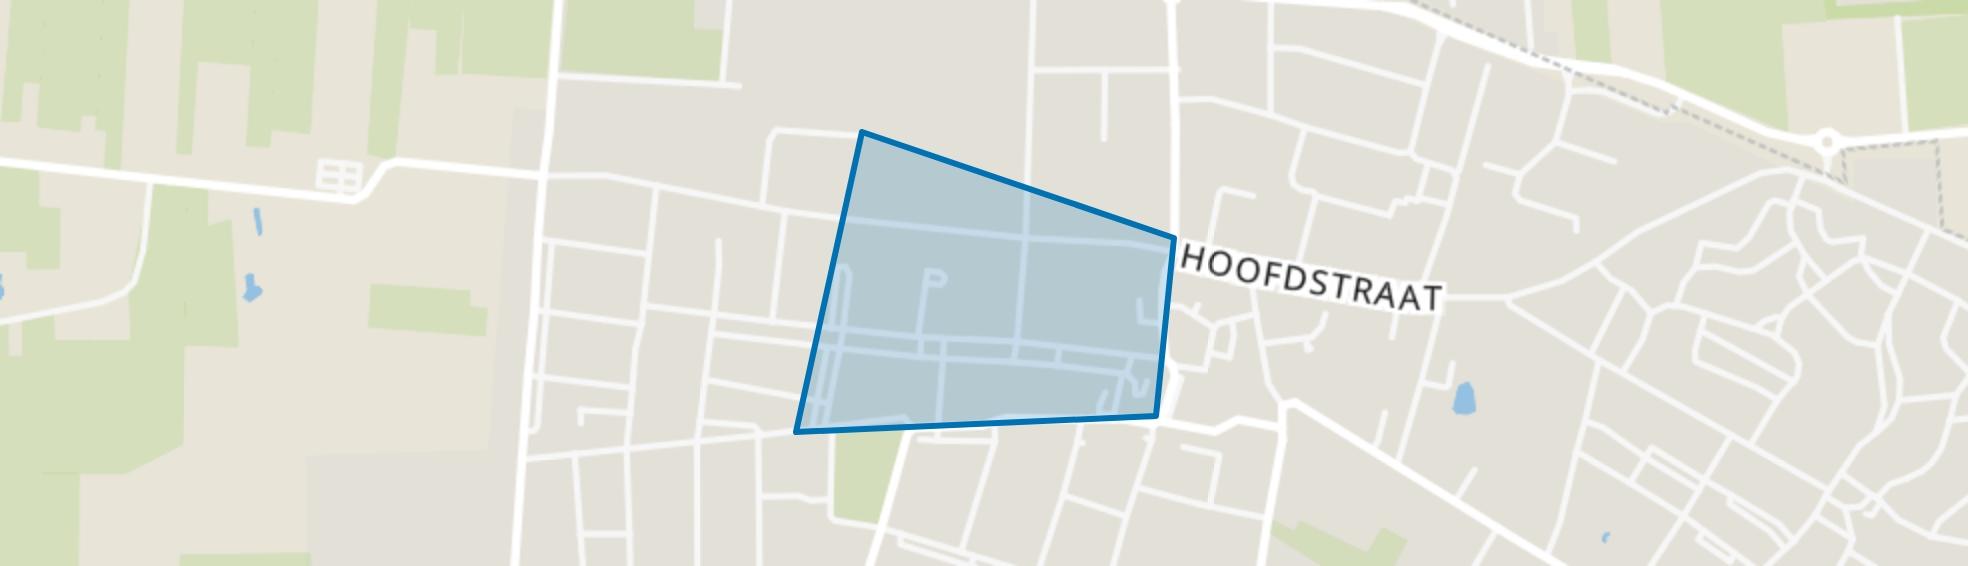 Vossenberg (oost), Kaatsheuvel map